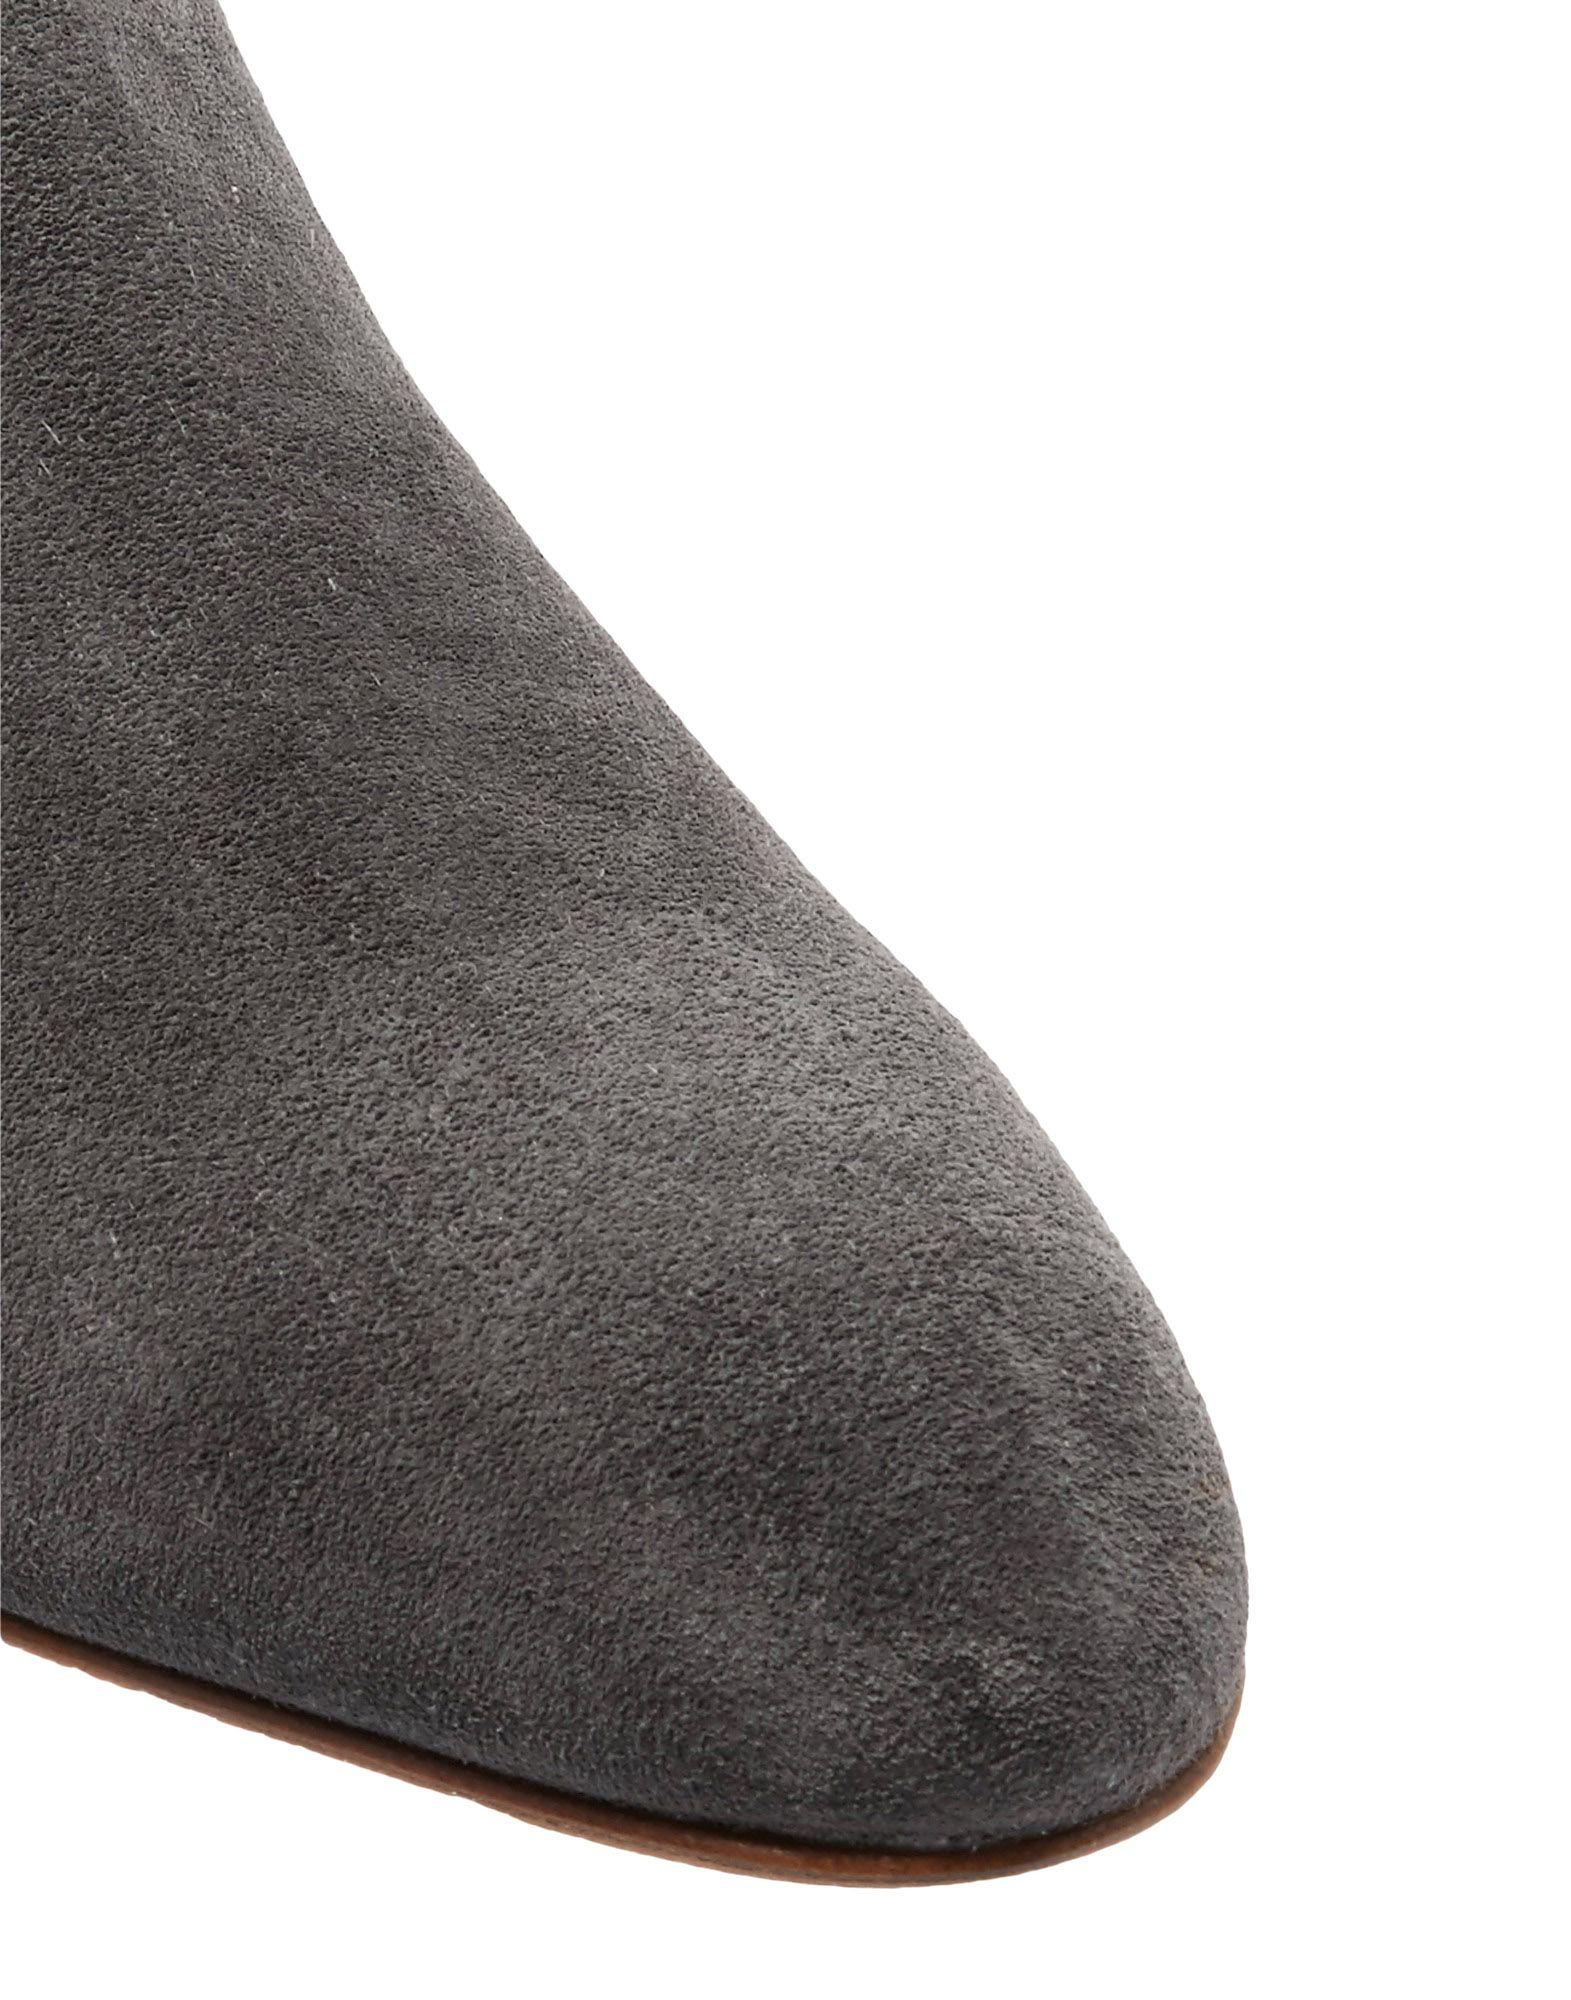 Rabatt Stiefelette Schuhe Rag & Bone Stiefelette Rabatt Damen  11514877DD f0d2a8